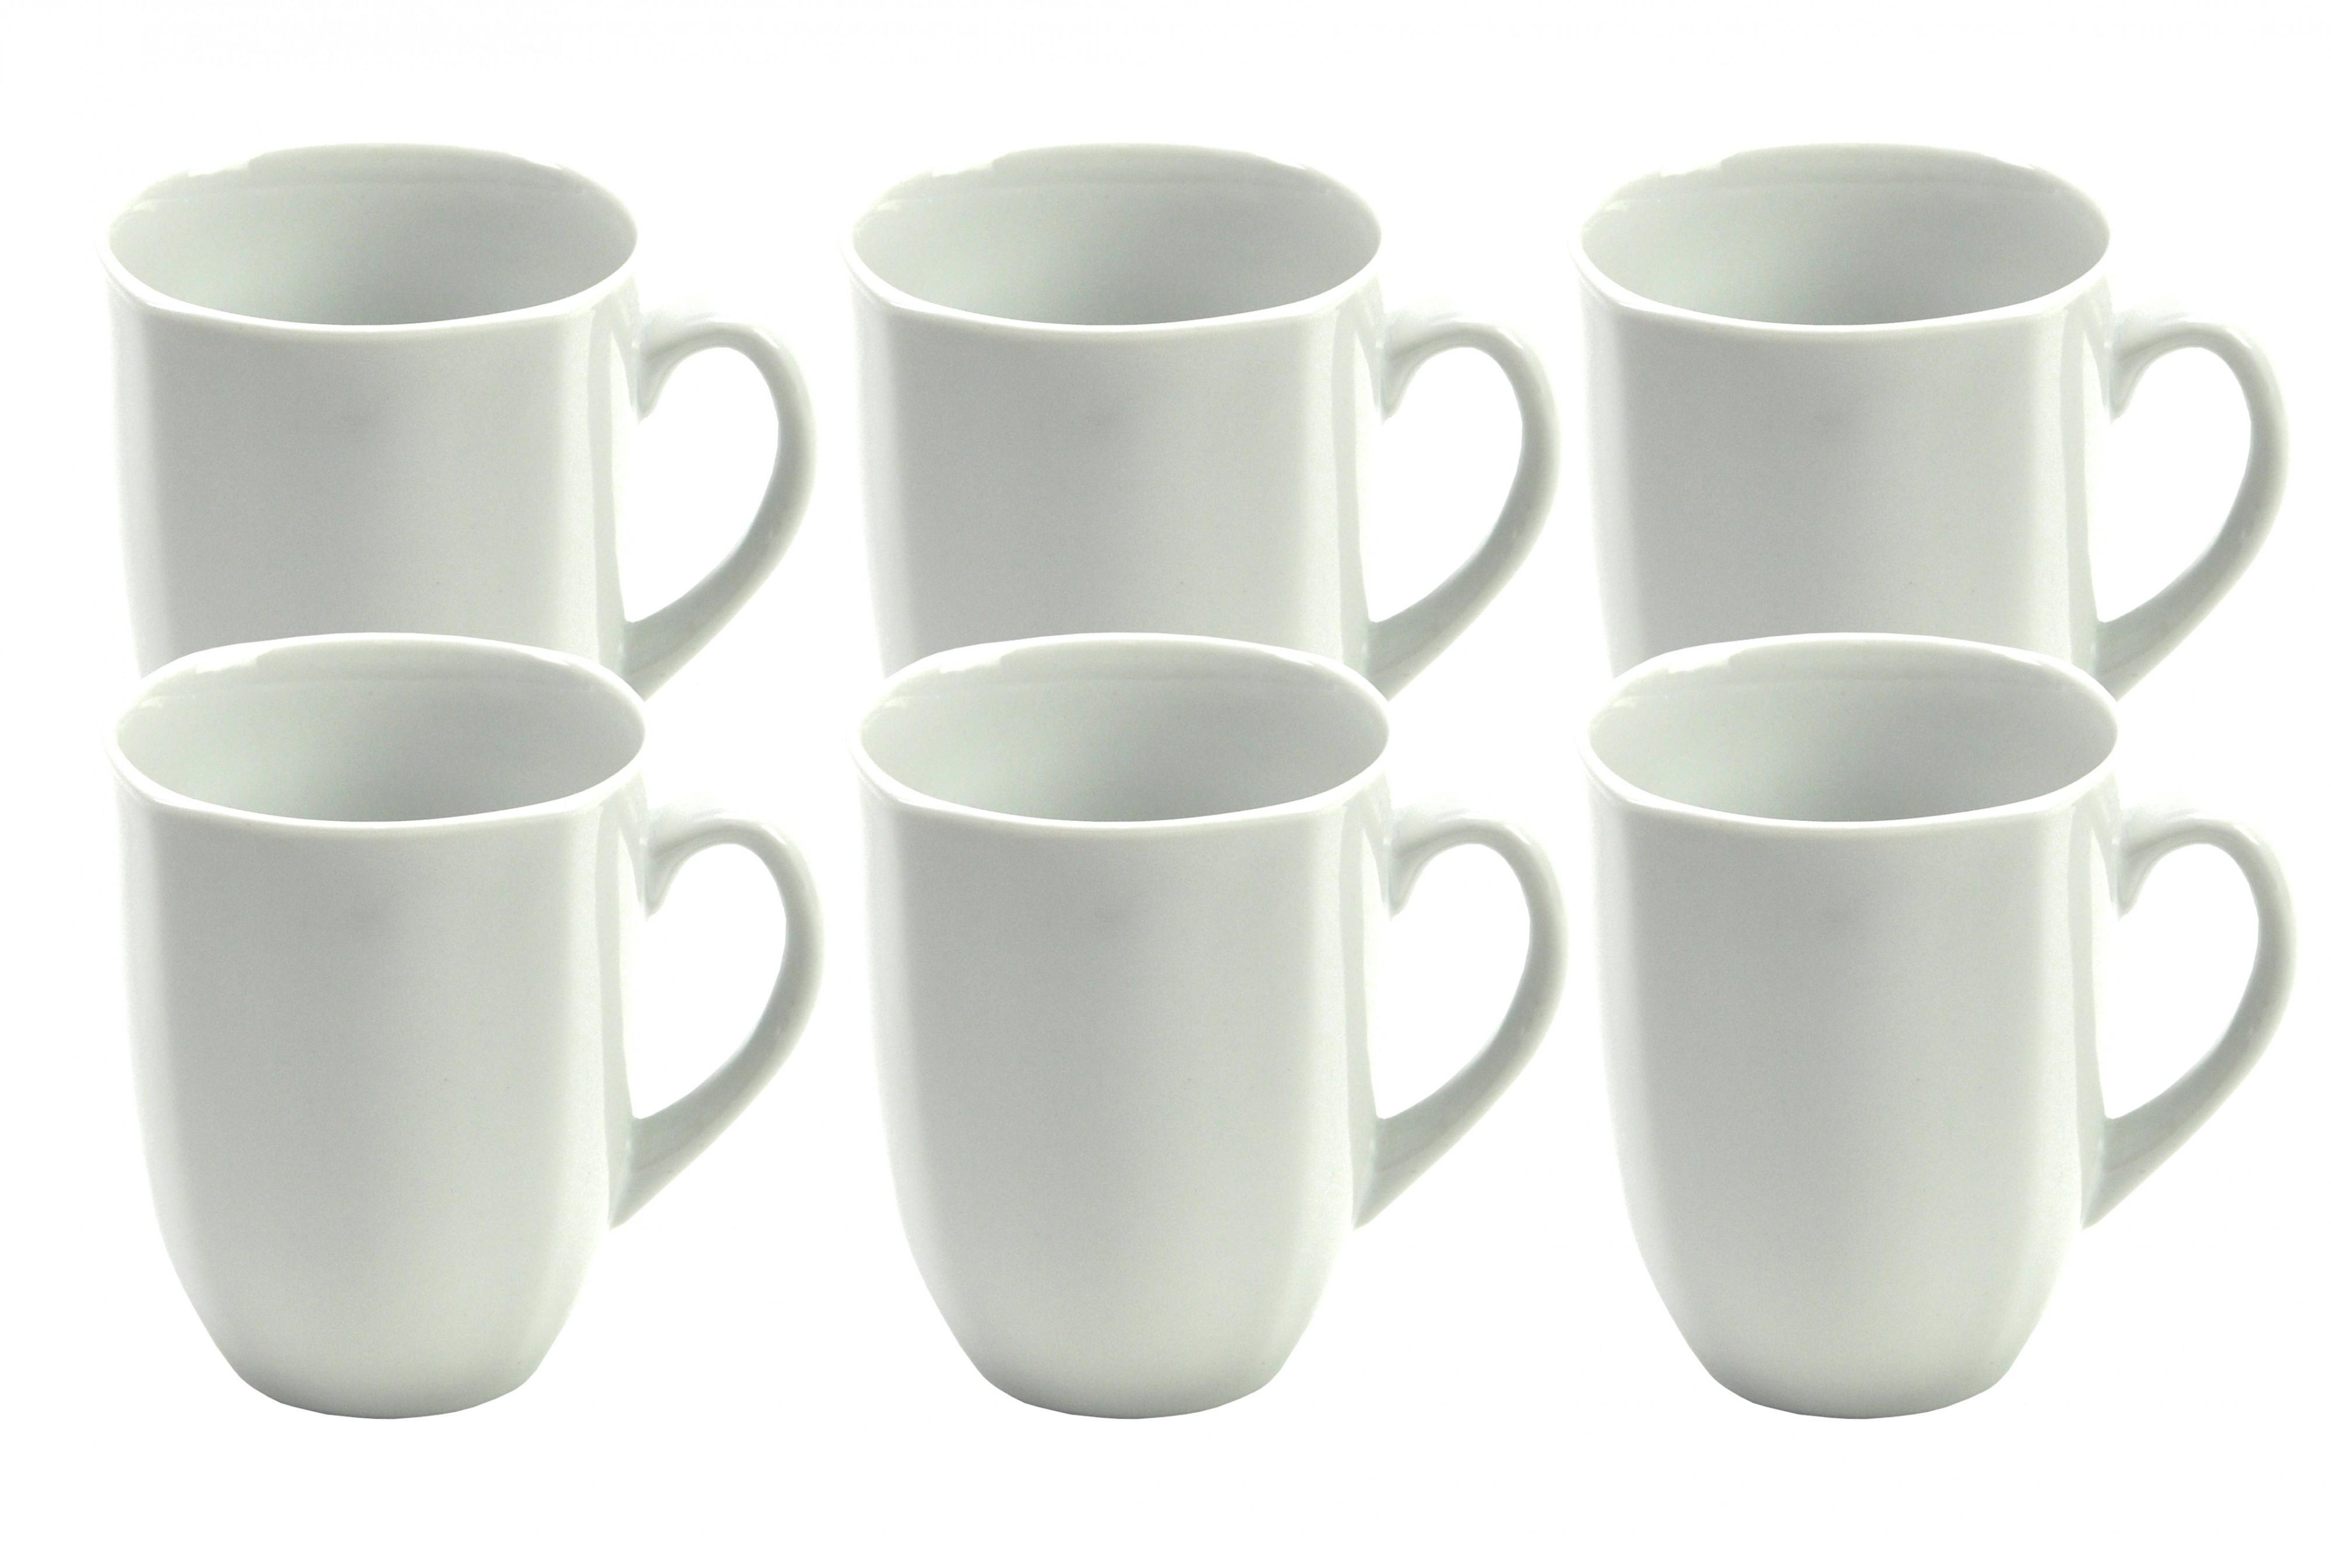 6er set kaffeebecher serie atrium 33cl porzellan tassen und becher. Black Bedroom Furniture Sets. Home Design Ideas